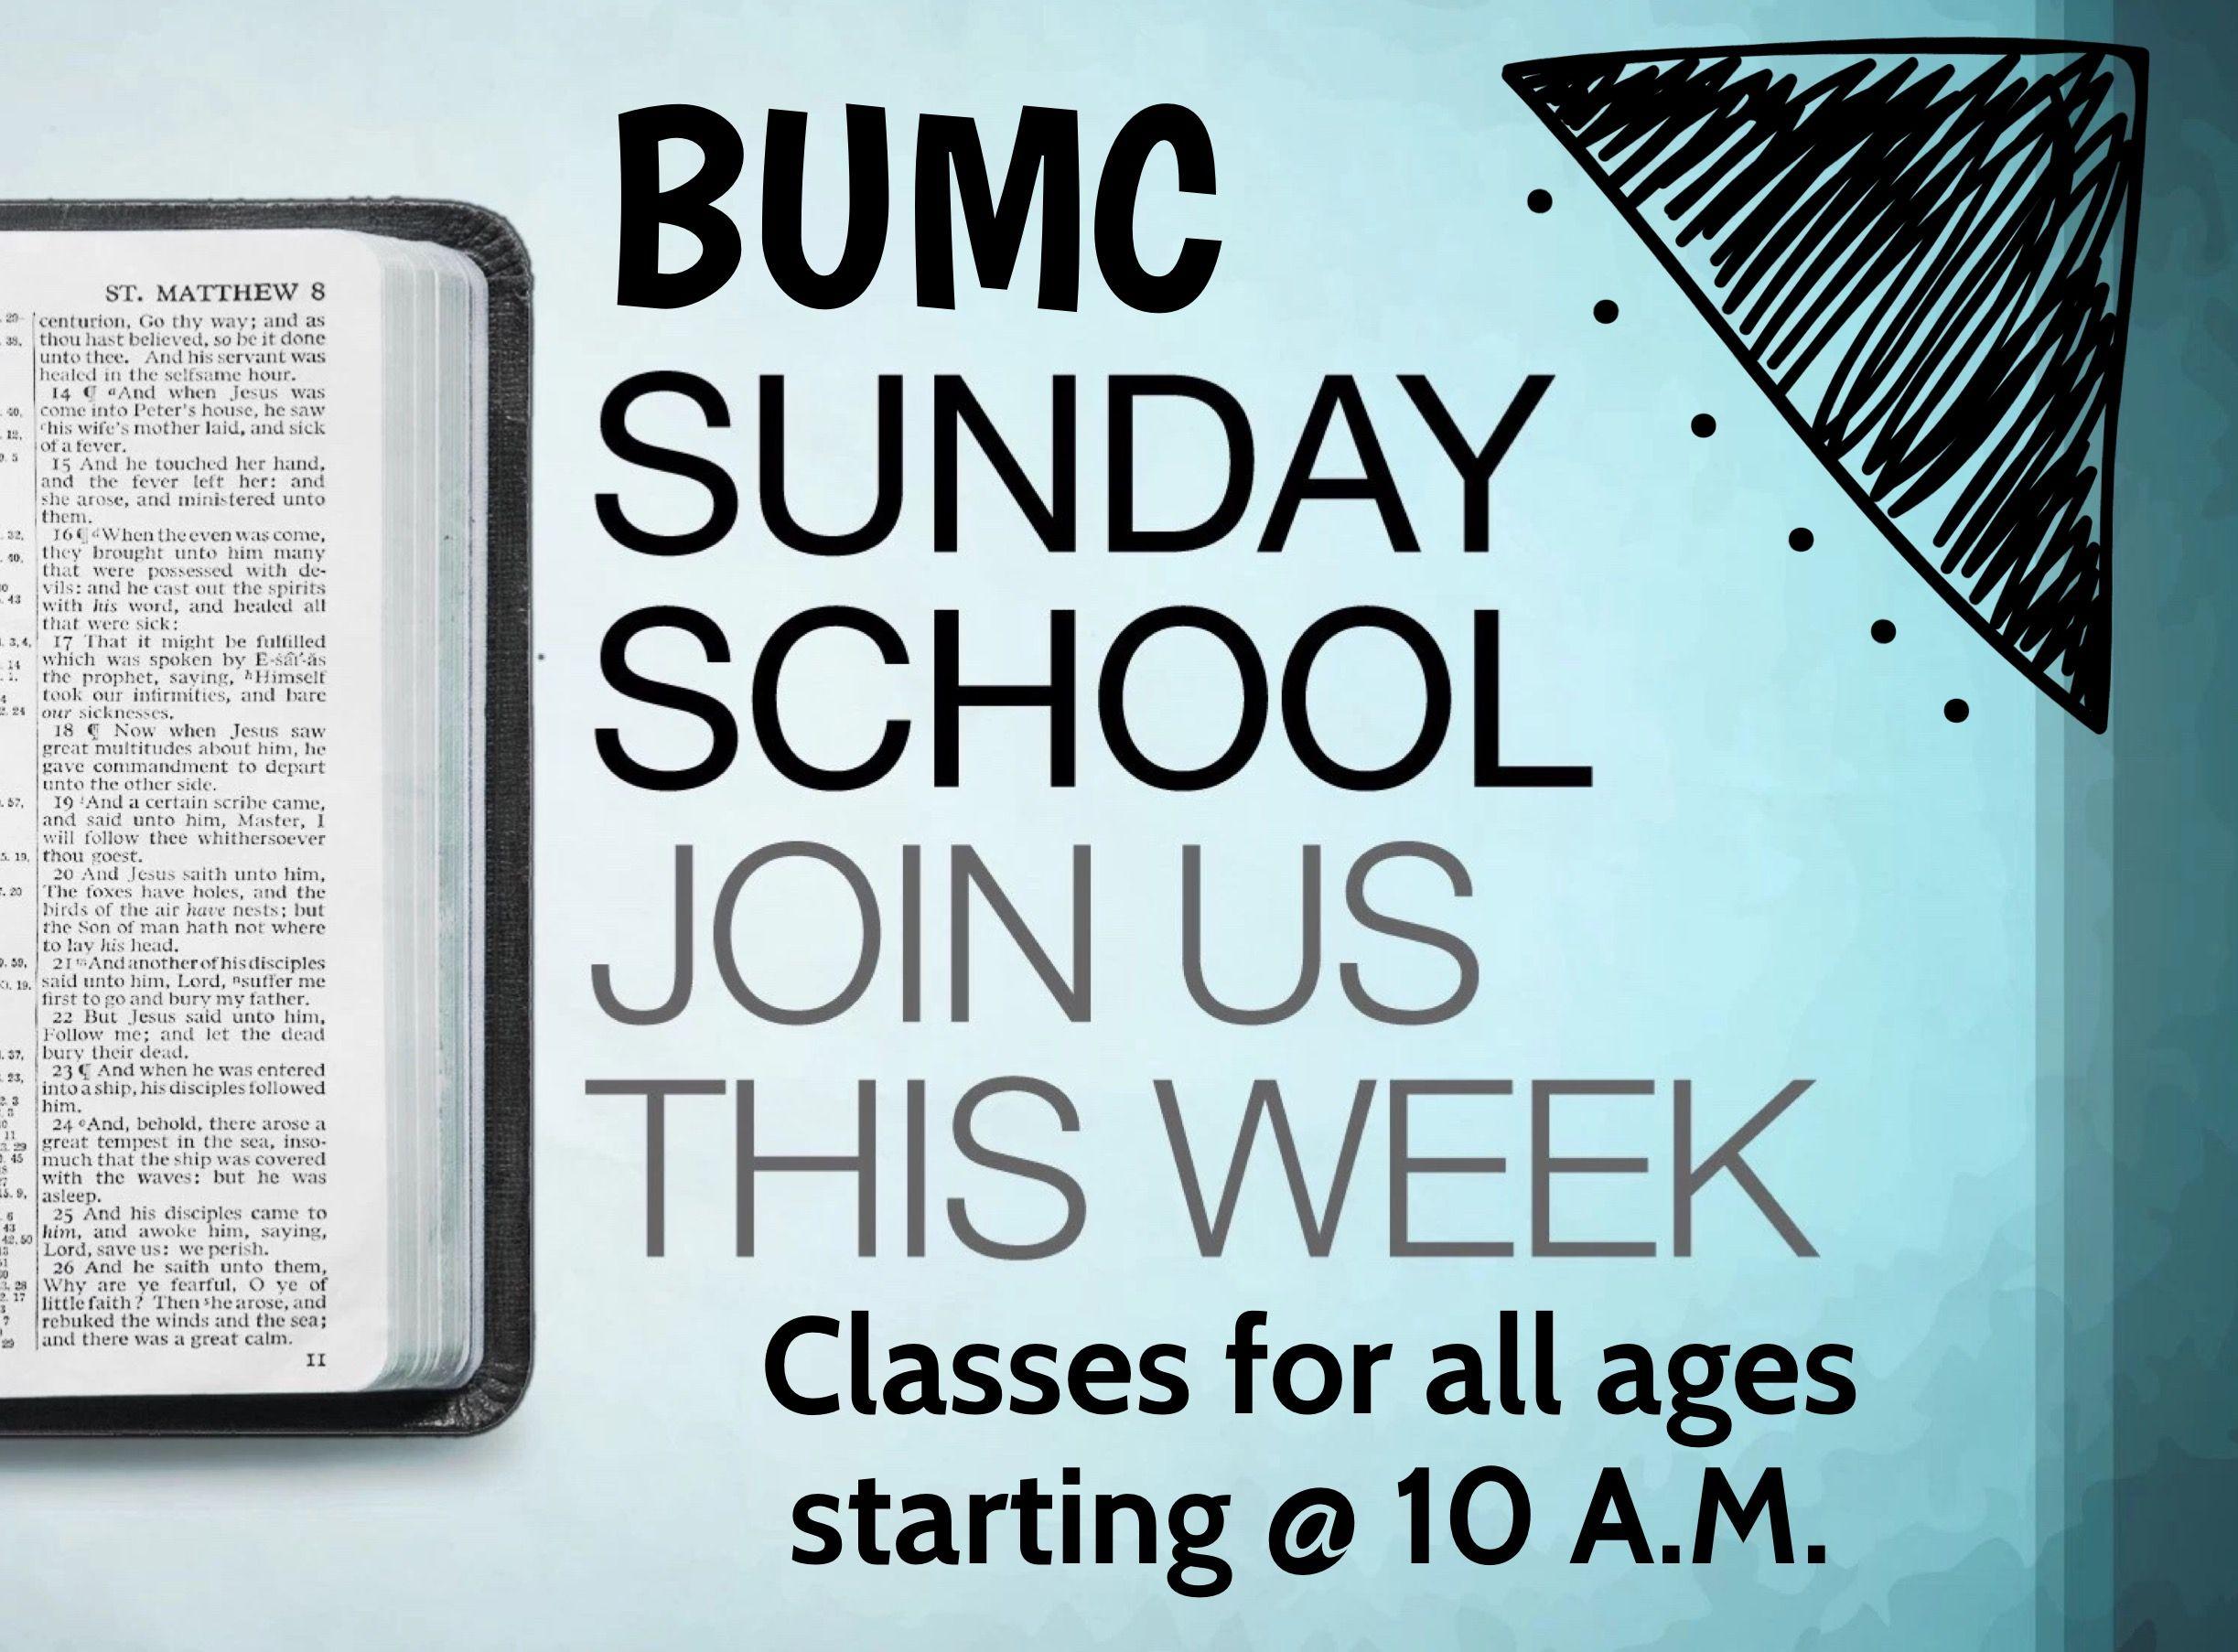 Join us weekly for sunday school sunday school saint